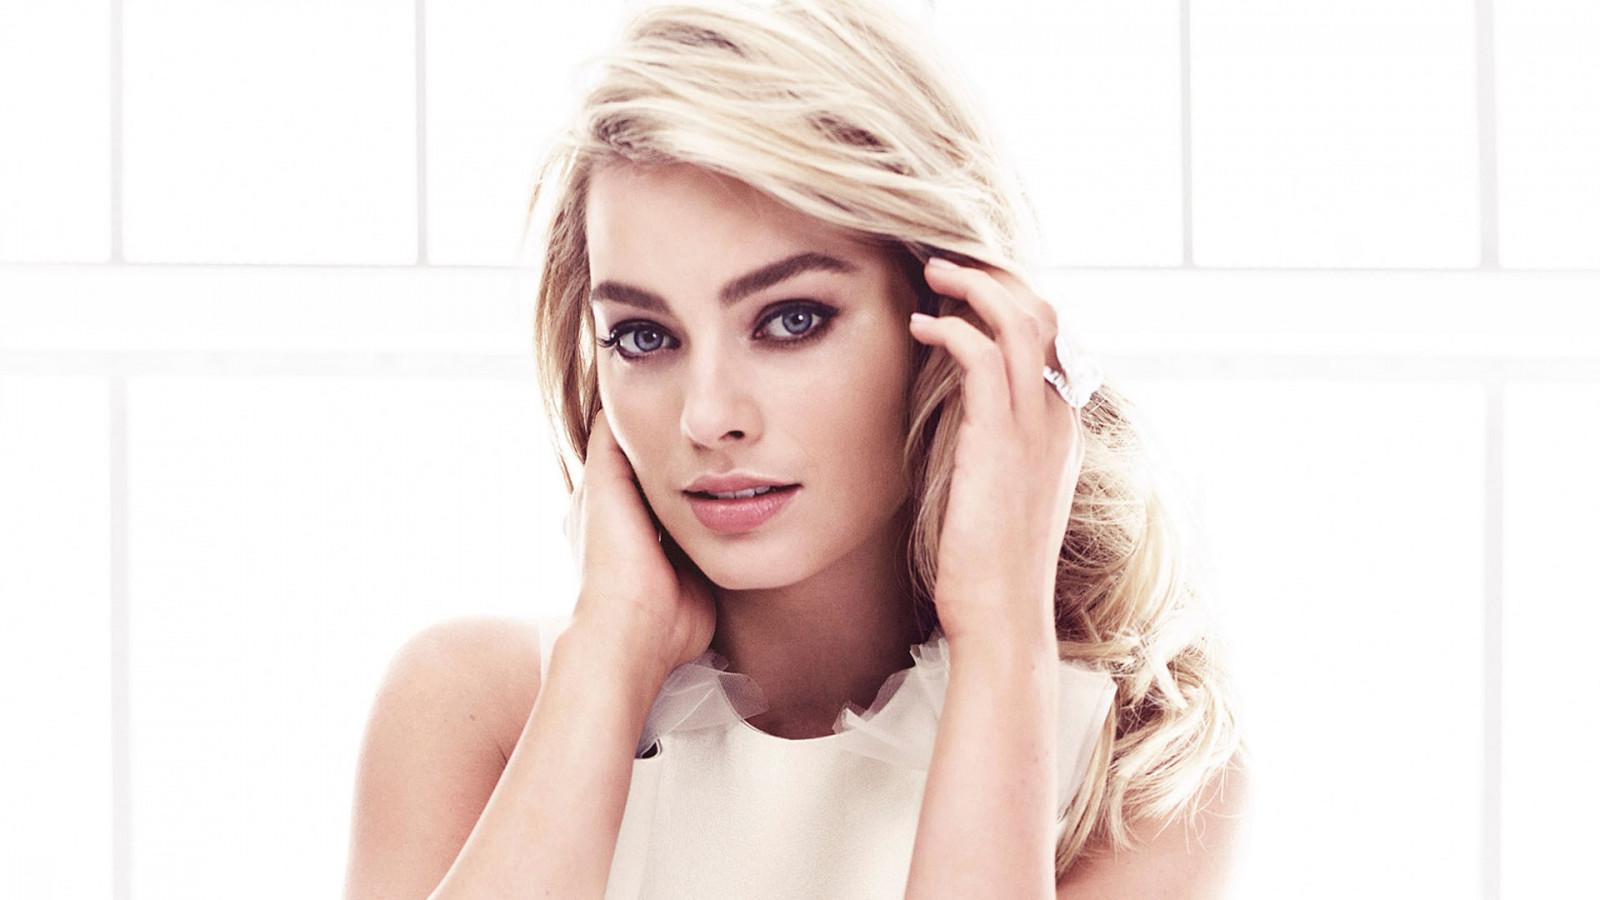 Wallpaper  Face, Women, Model, Blonde, Simple Background, Long Hair, Blue Eyes -9820